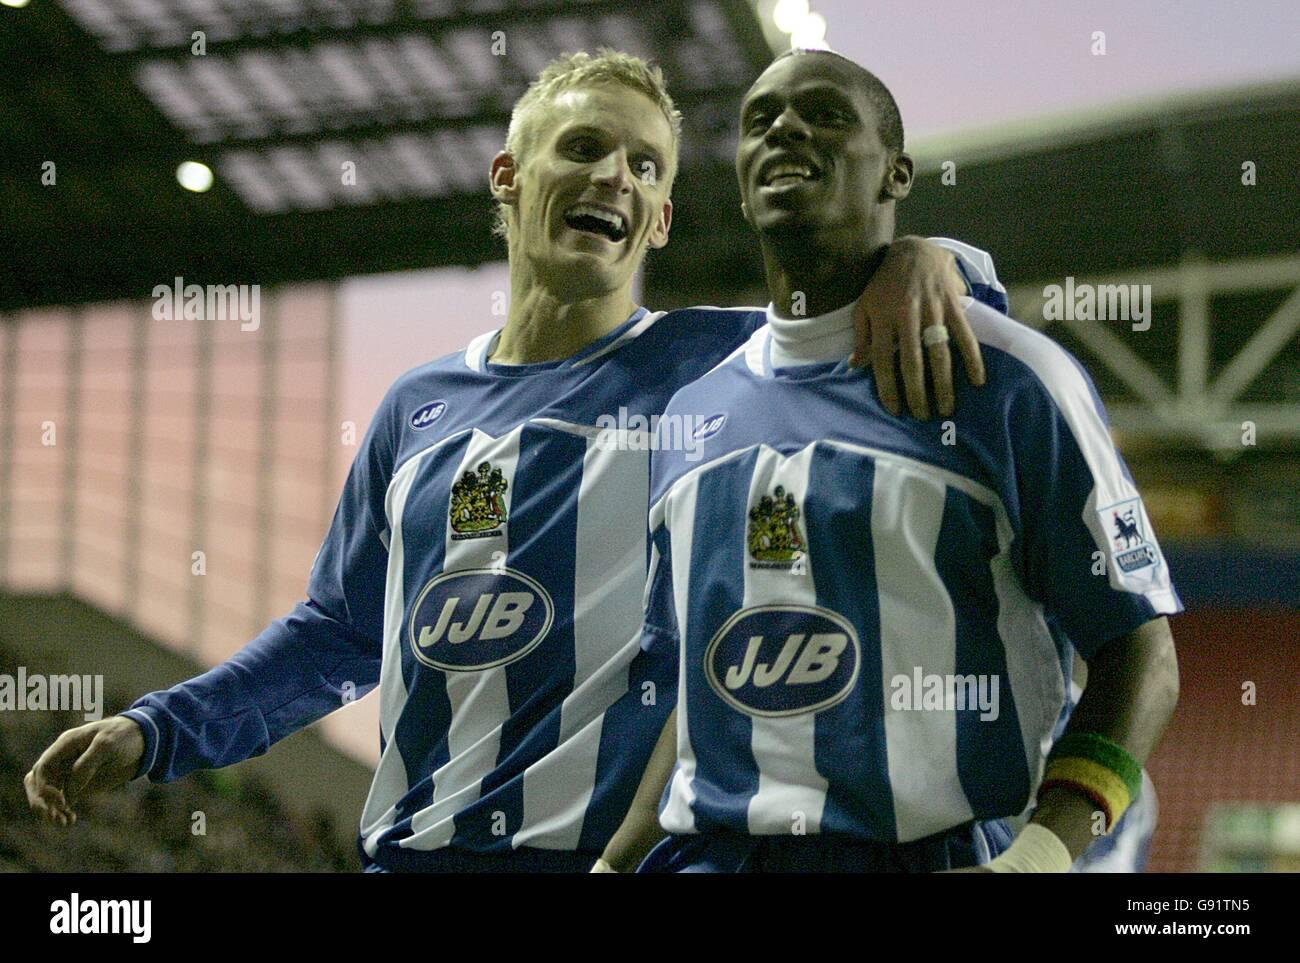 Soccer - FA Barclays Premiership - Wigan Athletic v Charlton Athletic - JJB Stadium - Stock Image